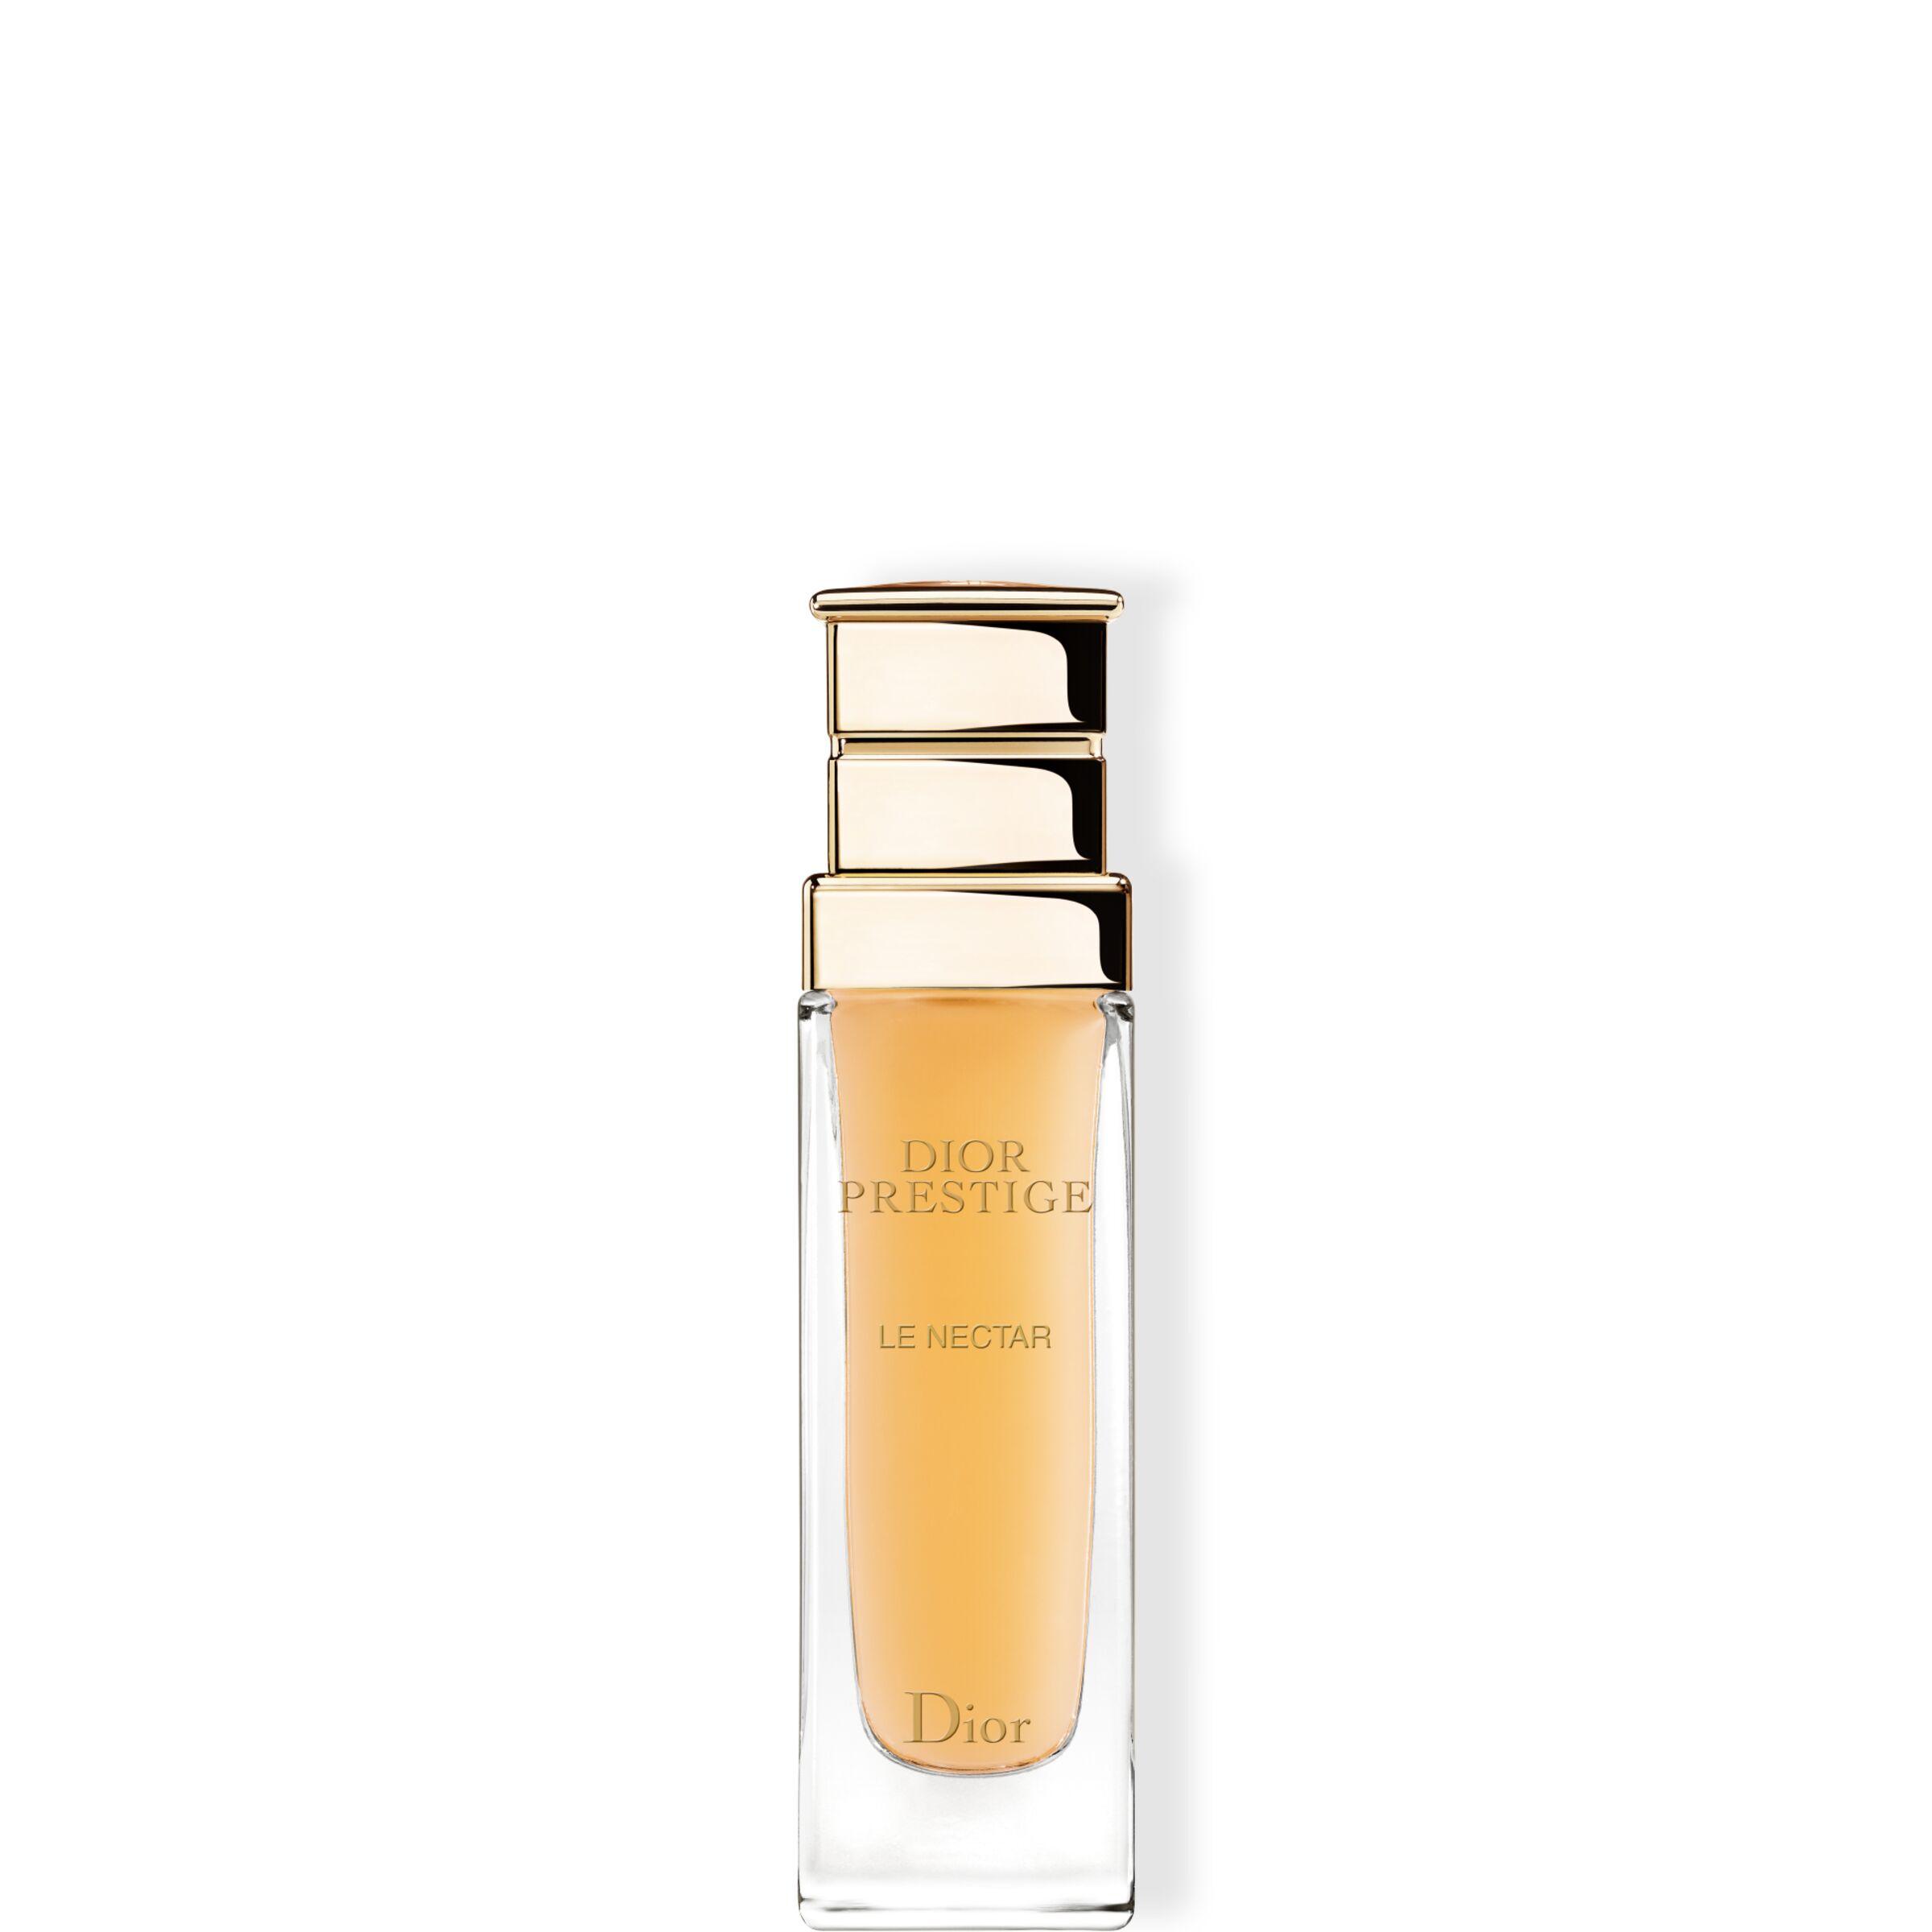 Dior Prestige Le Nectar 30ml